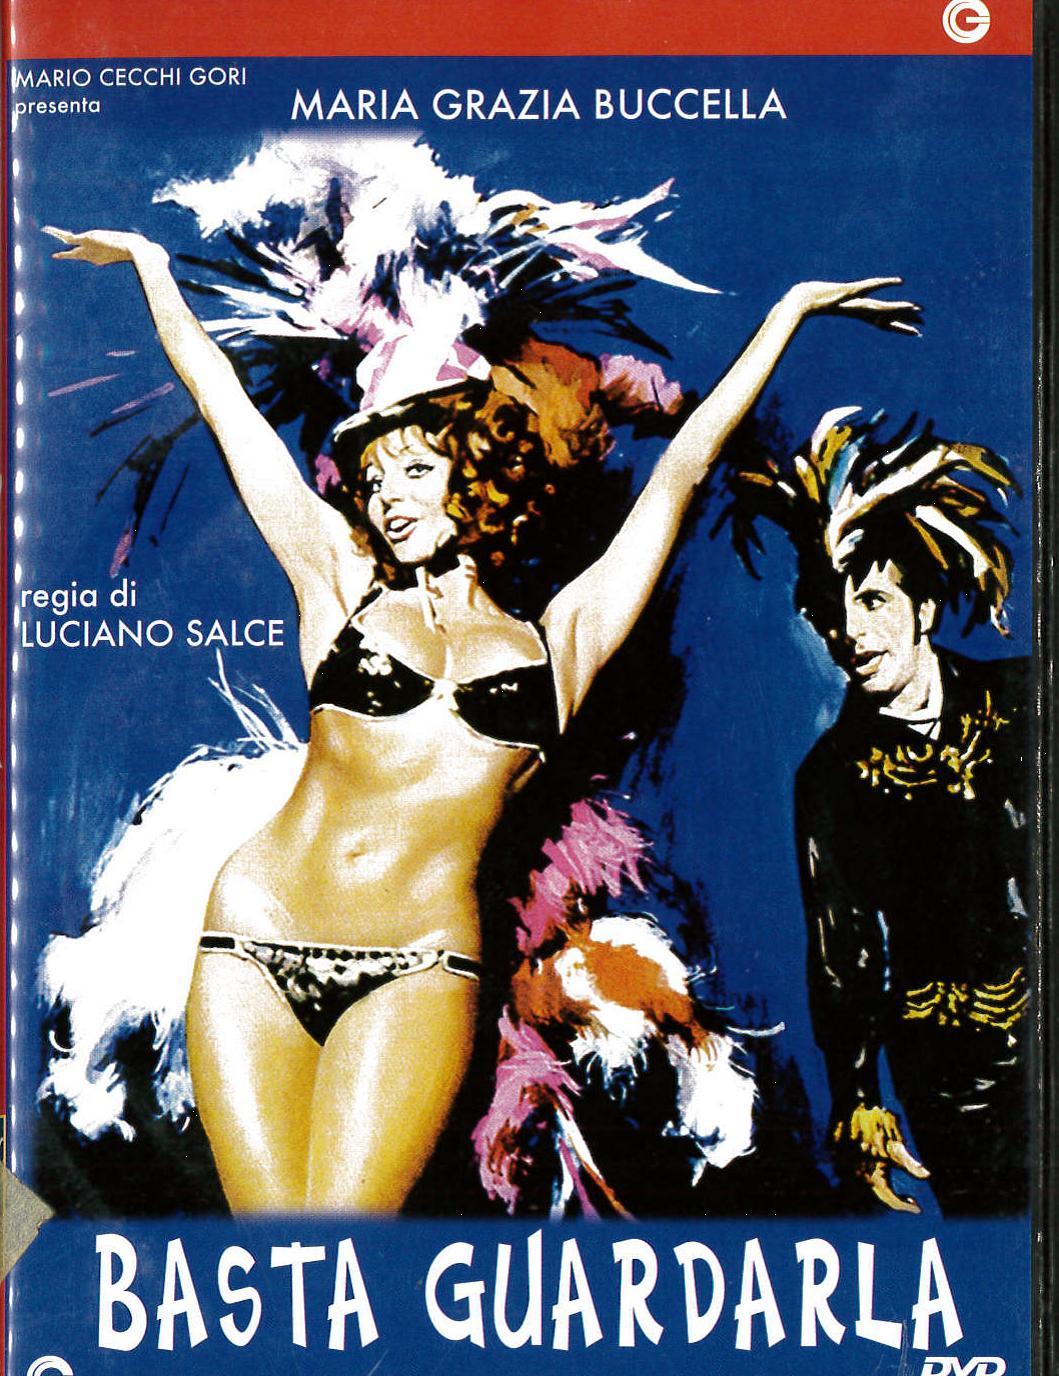 BASTA GUARDARLA - USATO EX NOLEGGIO (DVD)